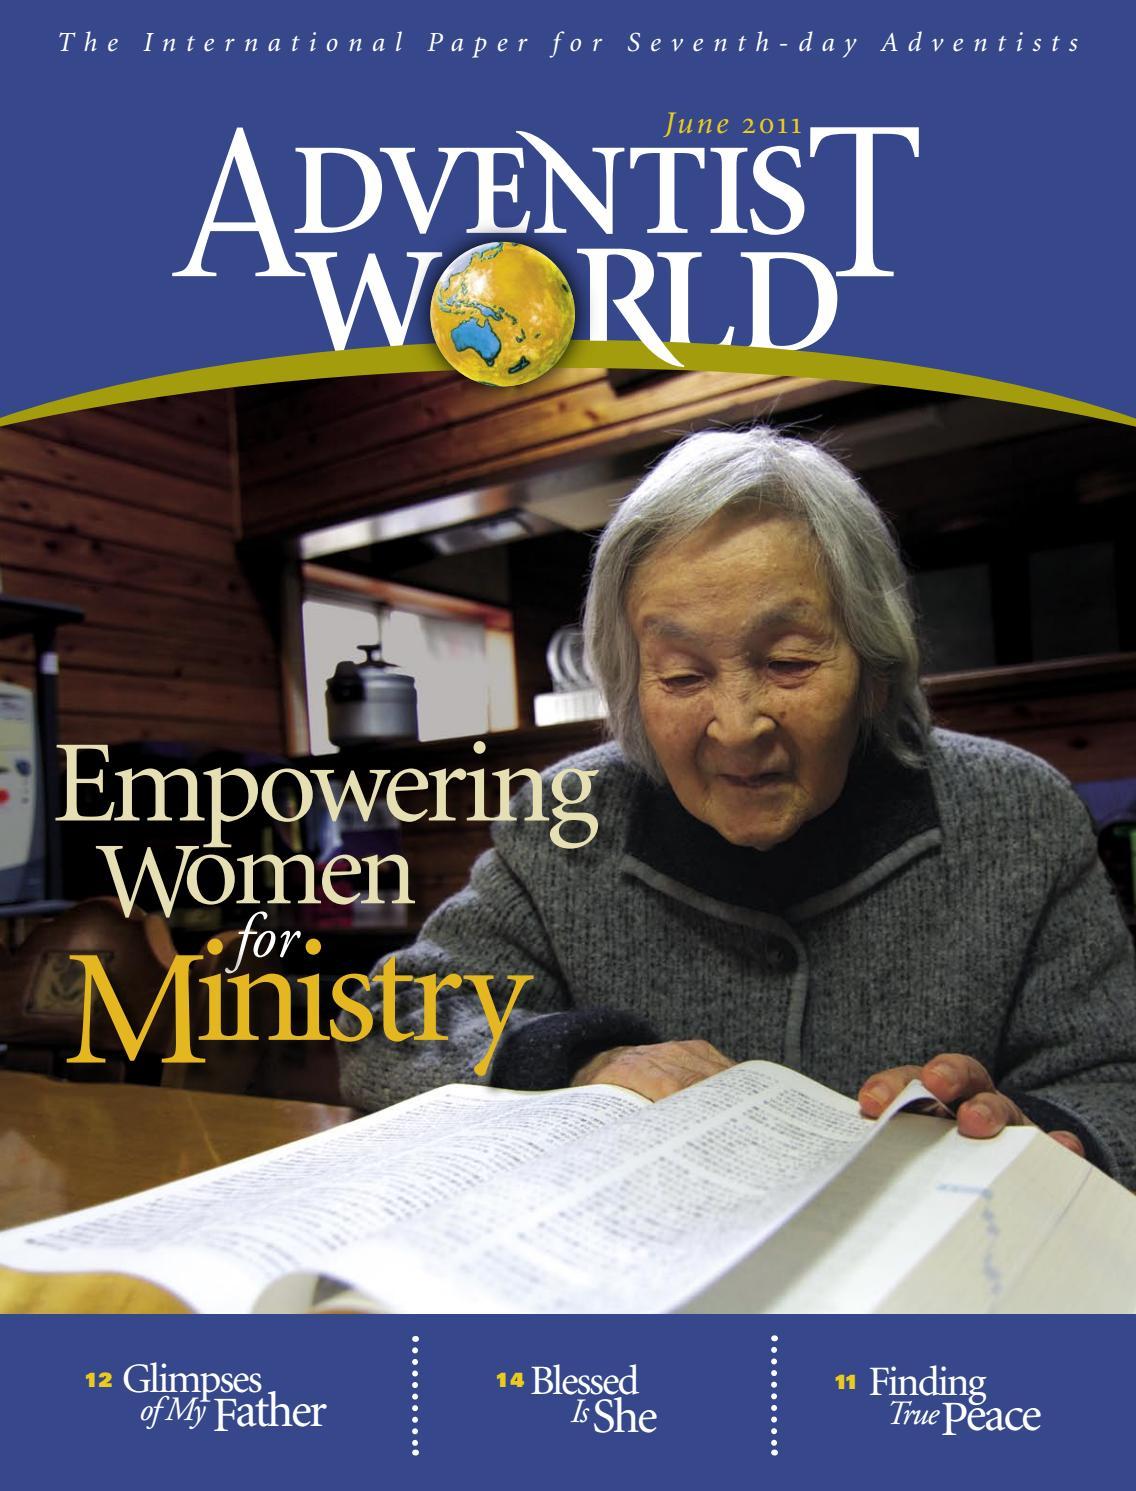 AW English - June 2011 pdf by Adventist World Magazine - issuu